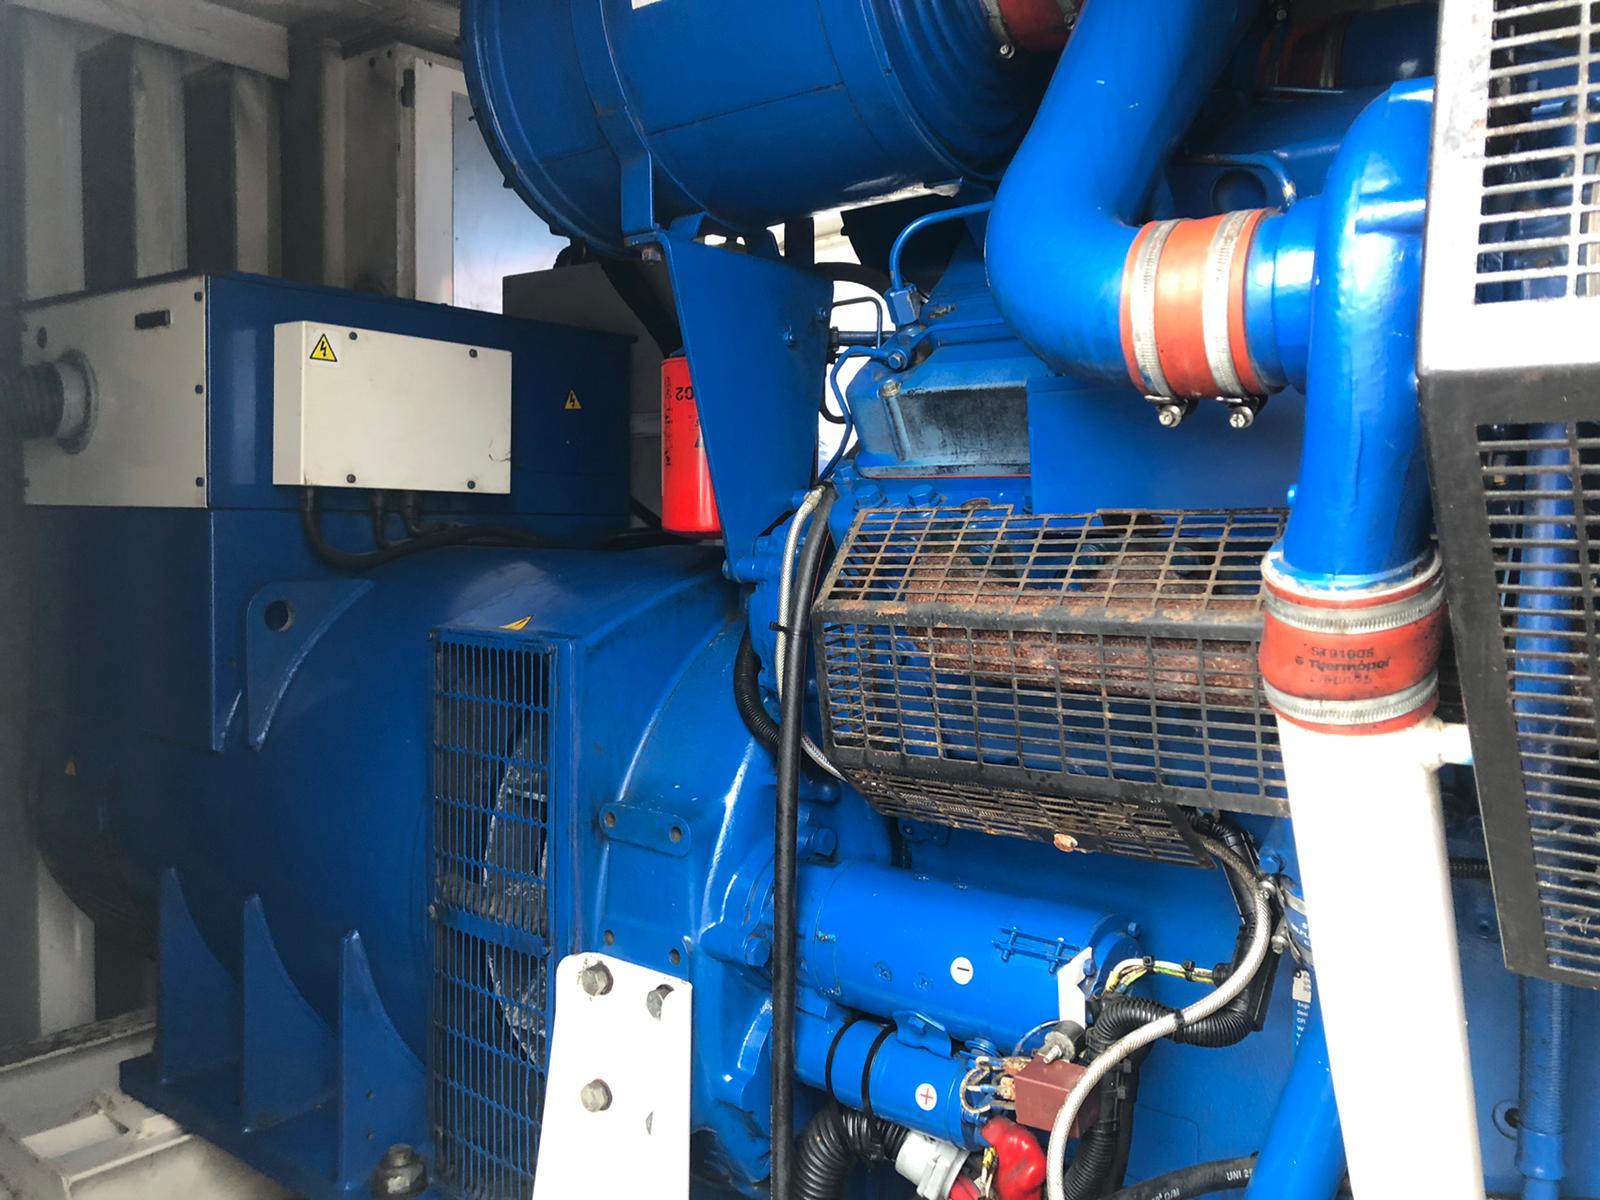 800 FG Wilson, Perkins/Stamford Generator 2